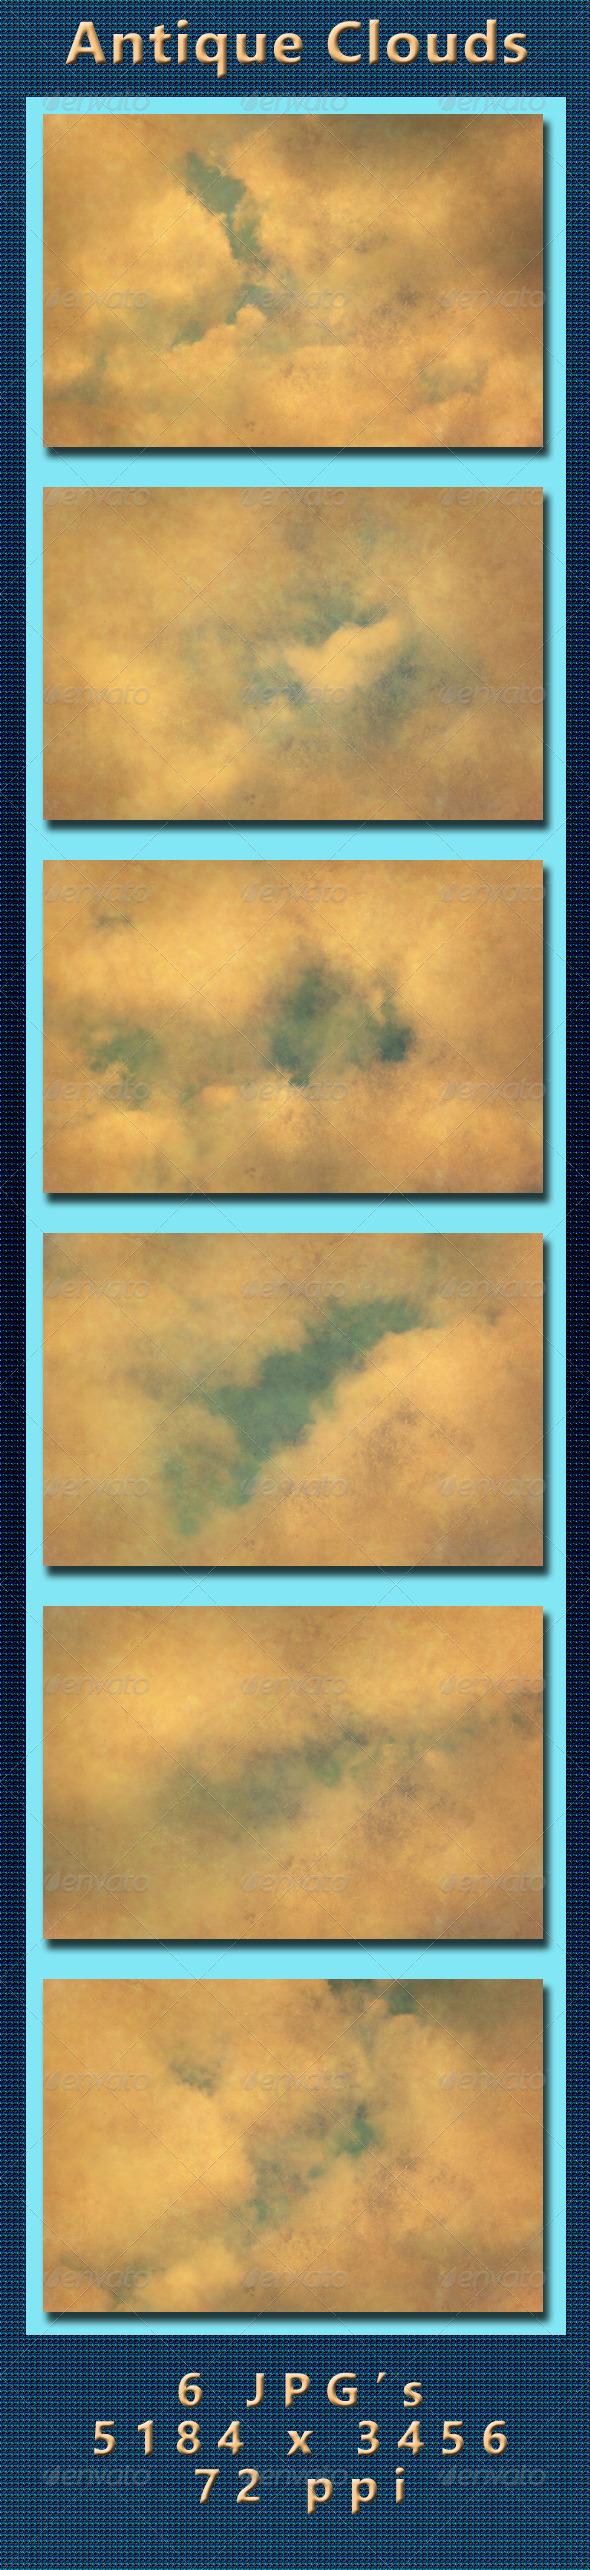 GraphicRiver Antique Clouds 4266315